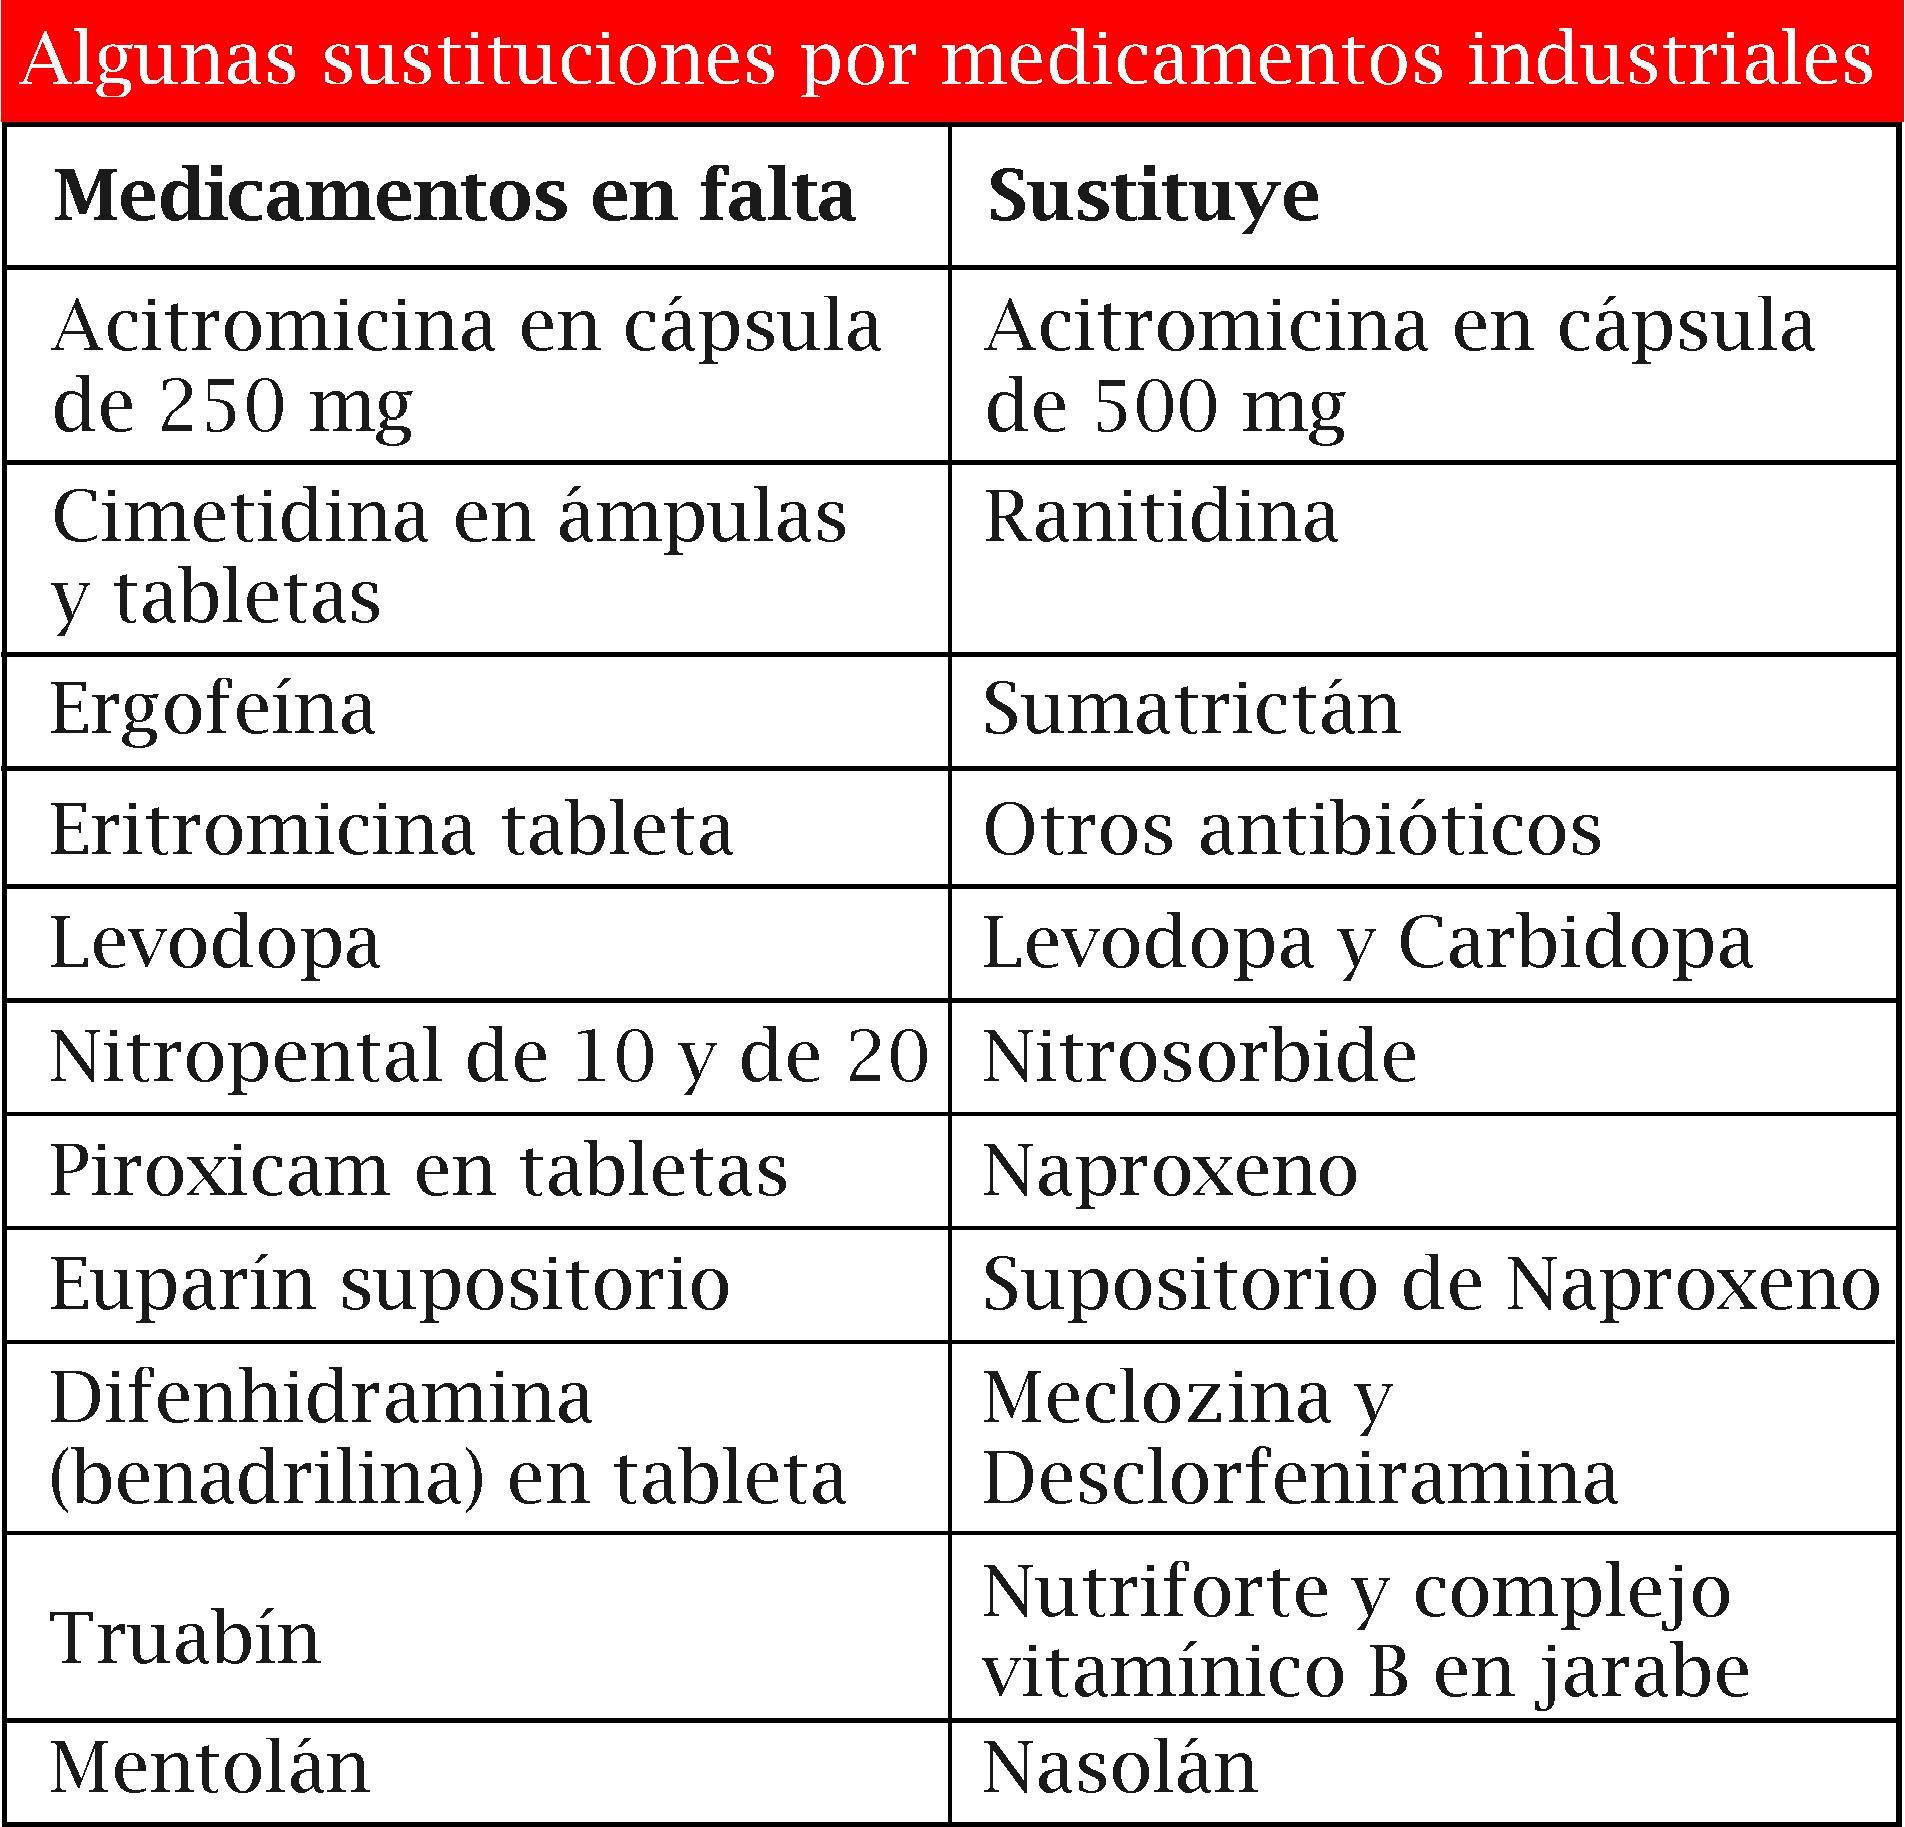 Medicamentos en falta: A involuntarios escollos, naturales alternativas